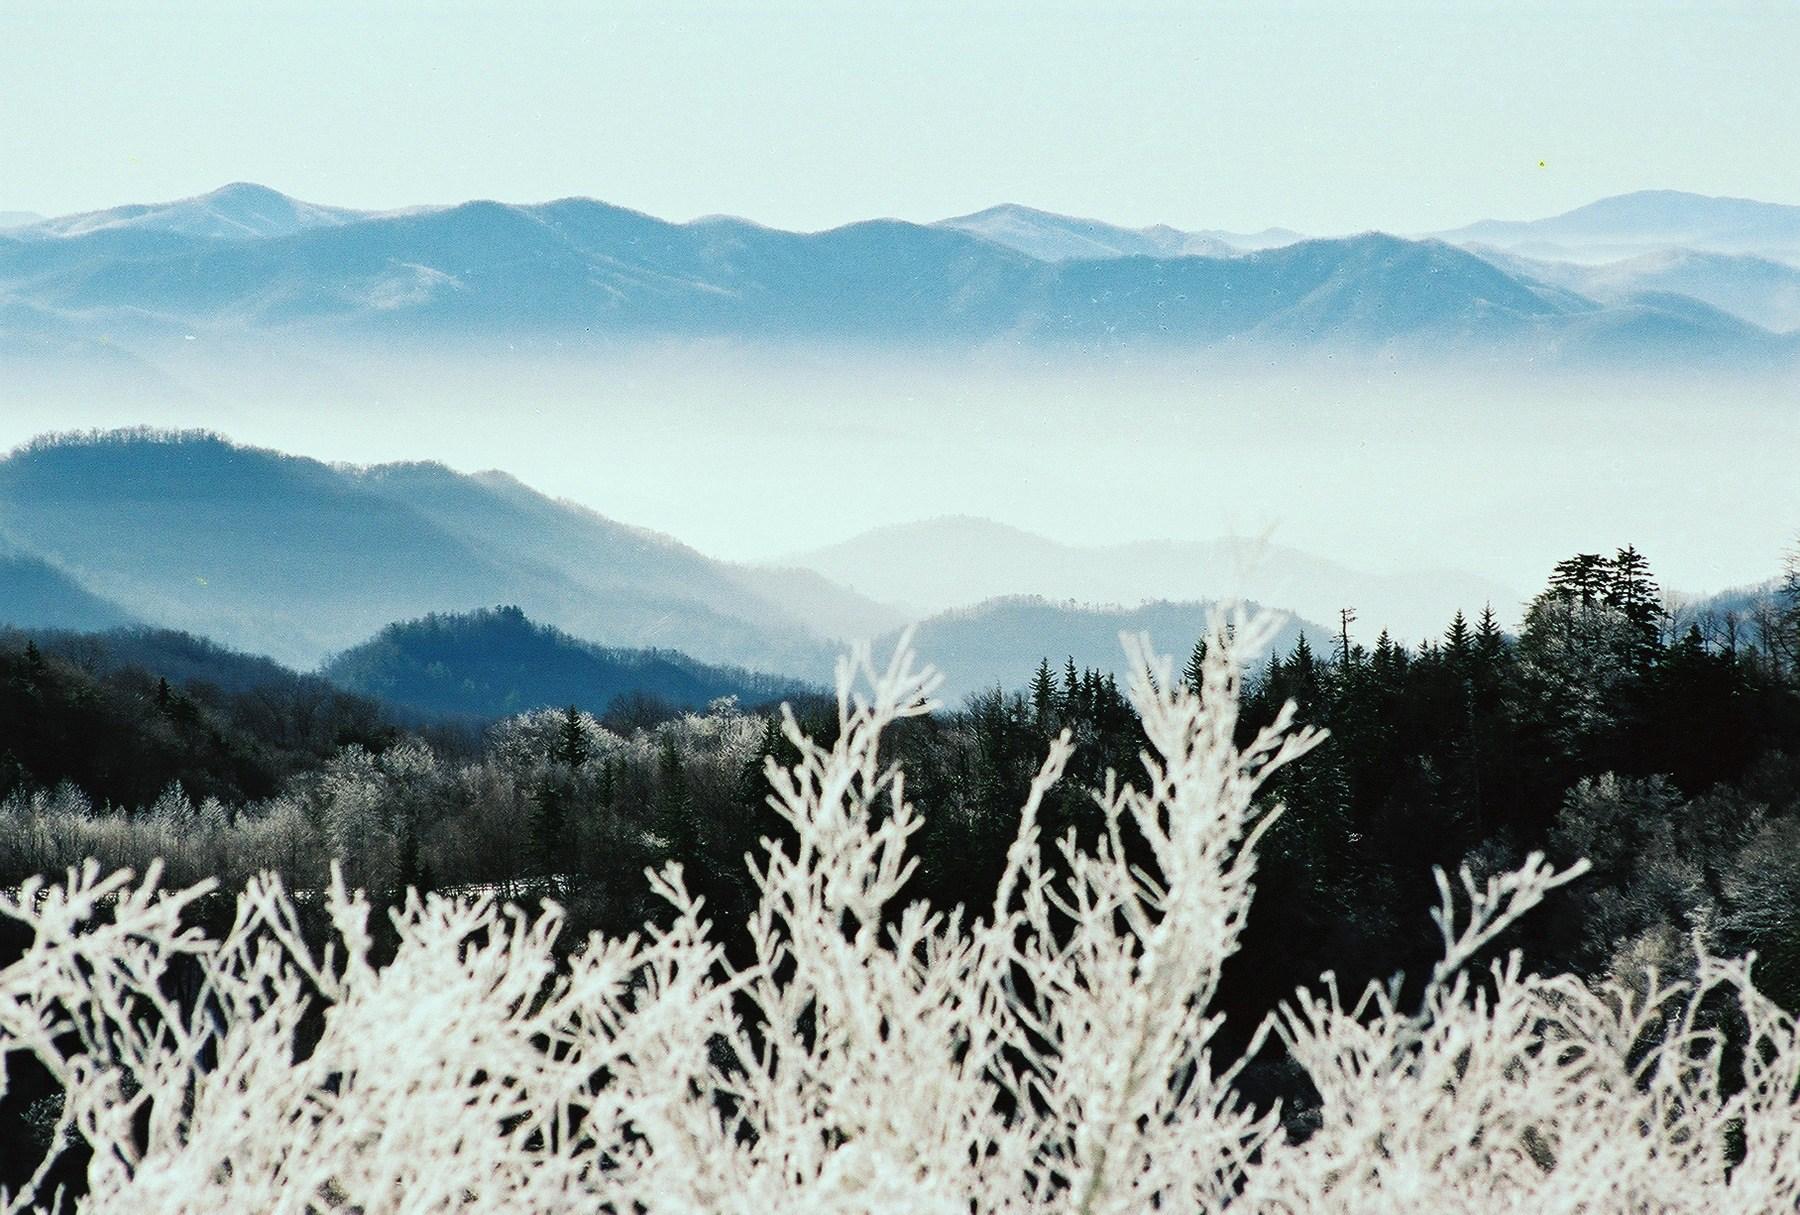 smoky mountain winterfest image.jpg